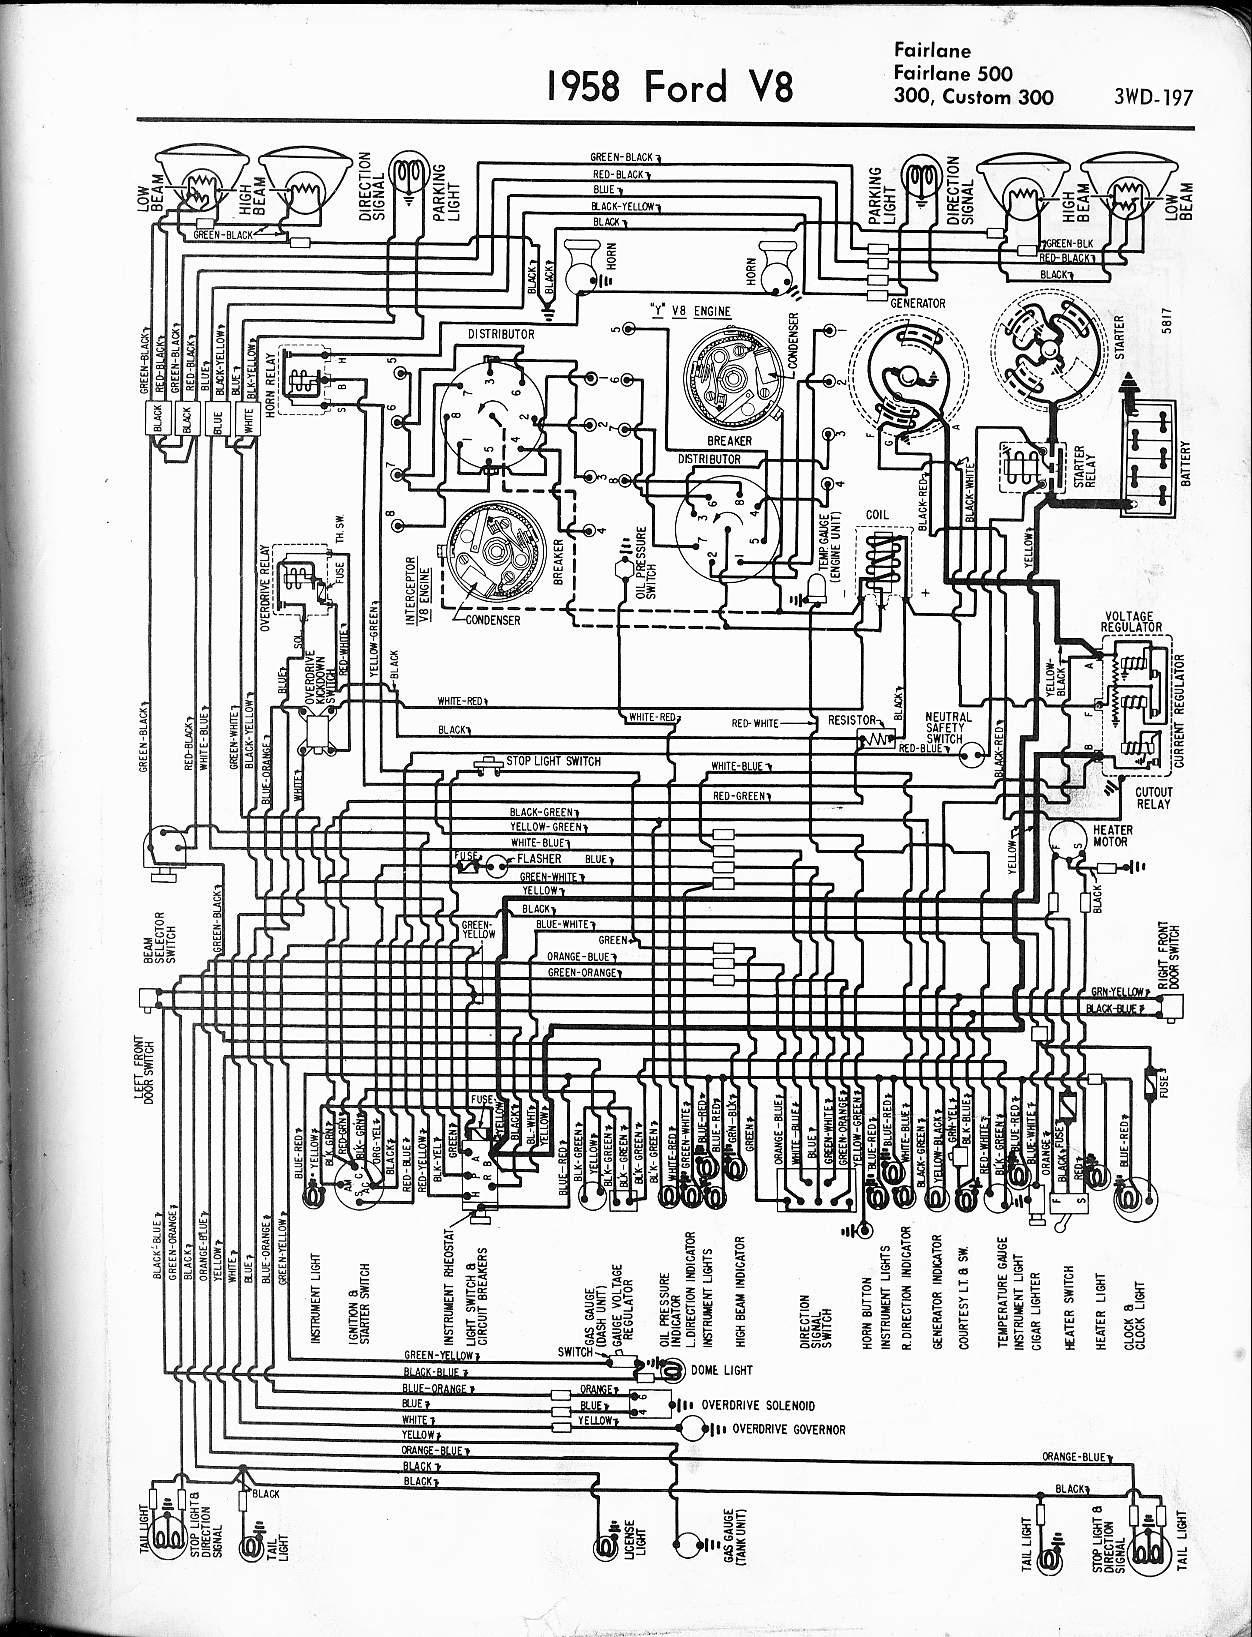 Ford Fairlane Wiring Harnes - Wiring DiagramWiring Diagram